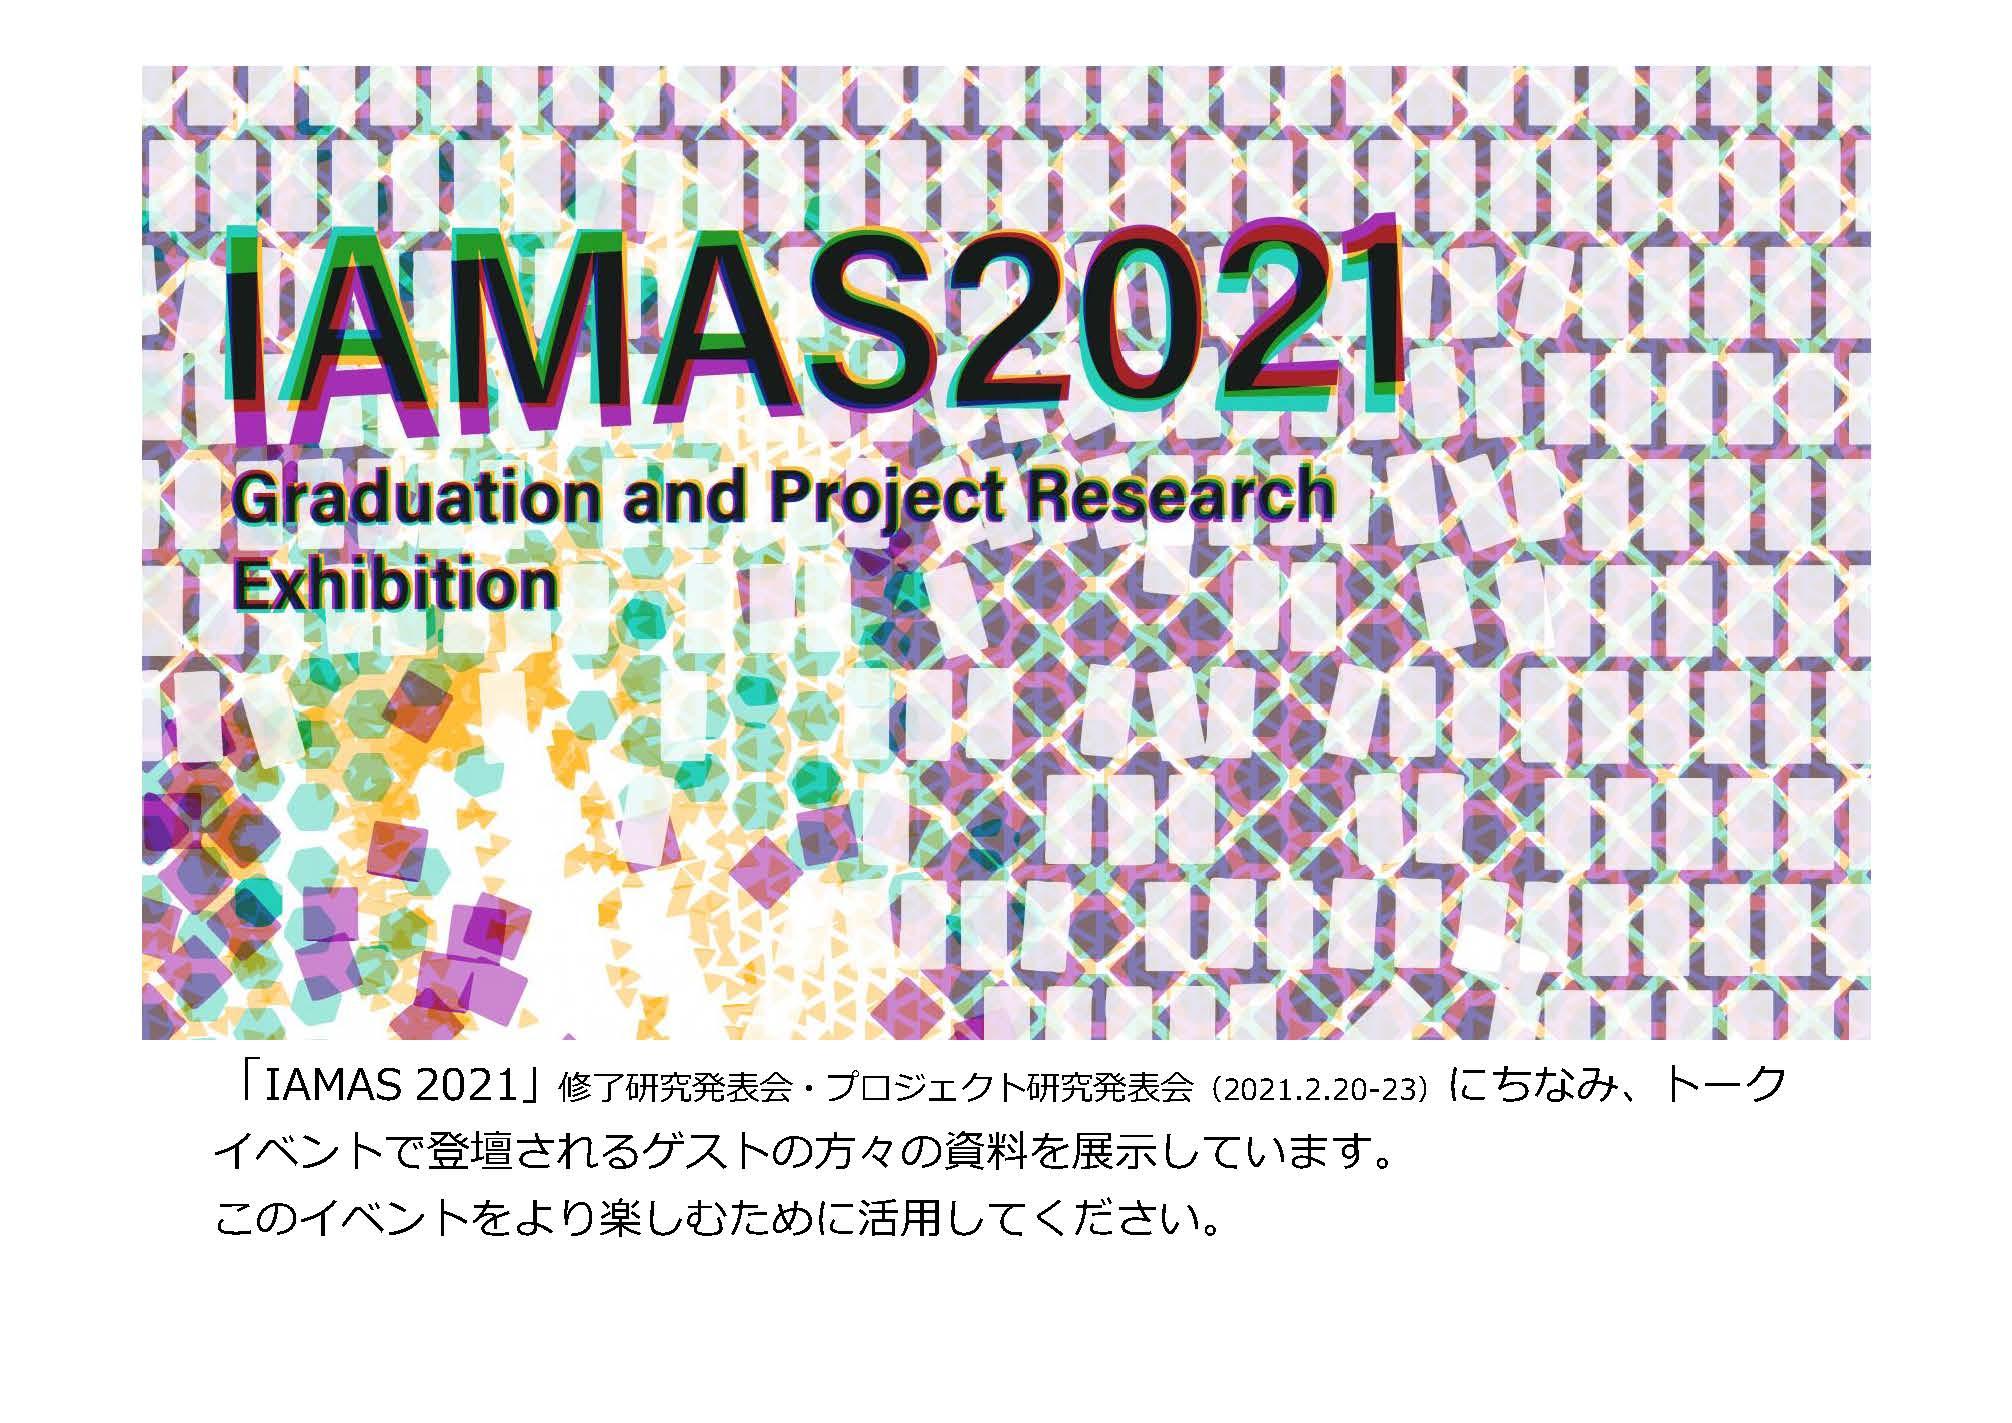 IAMAS2021資料展示